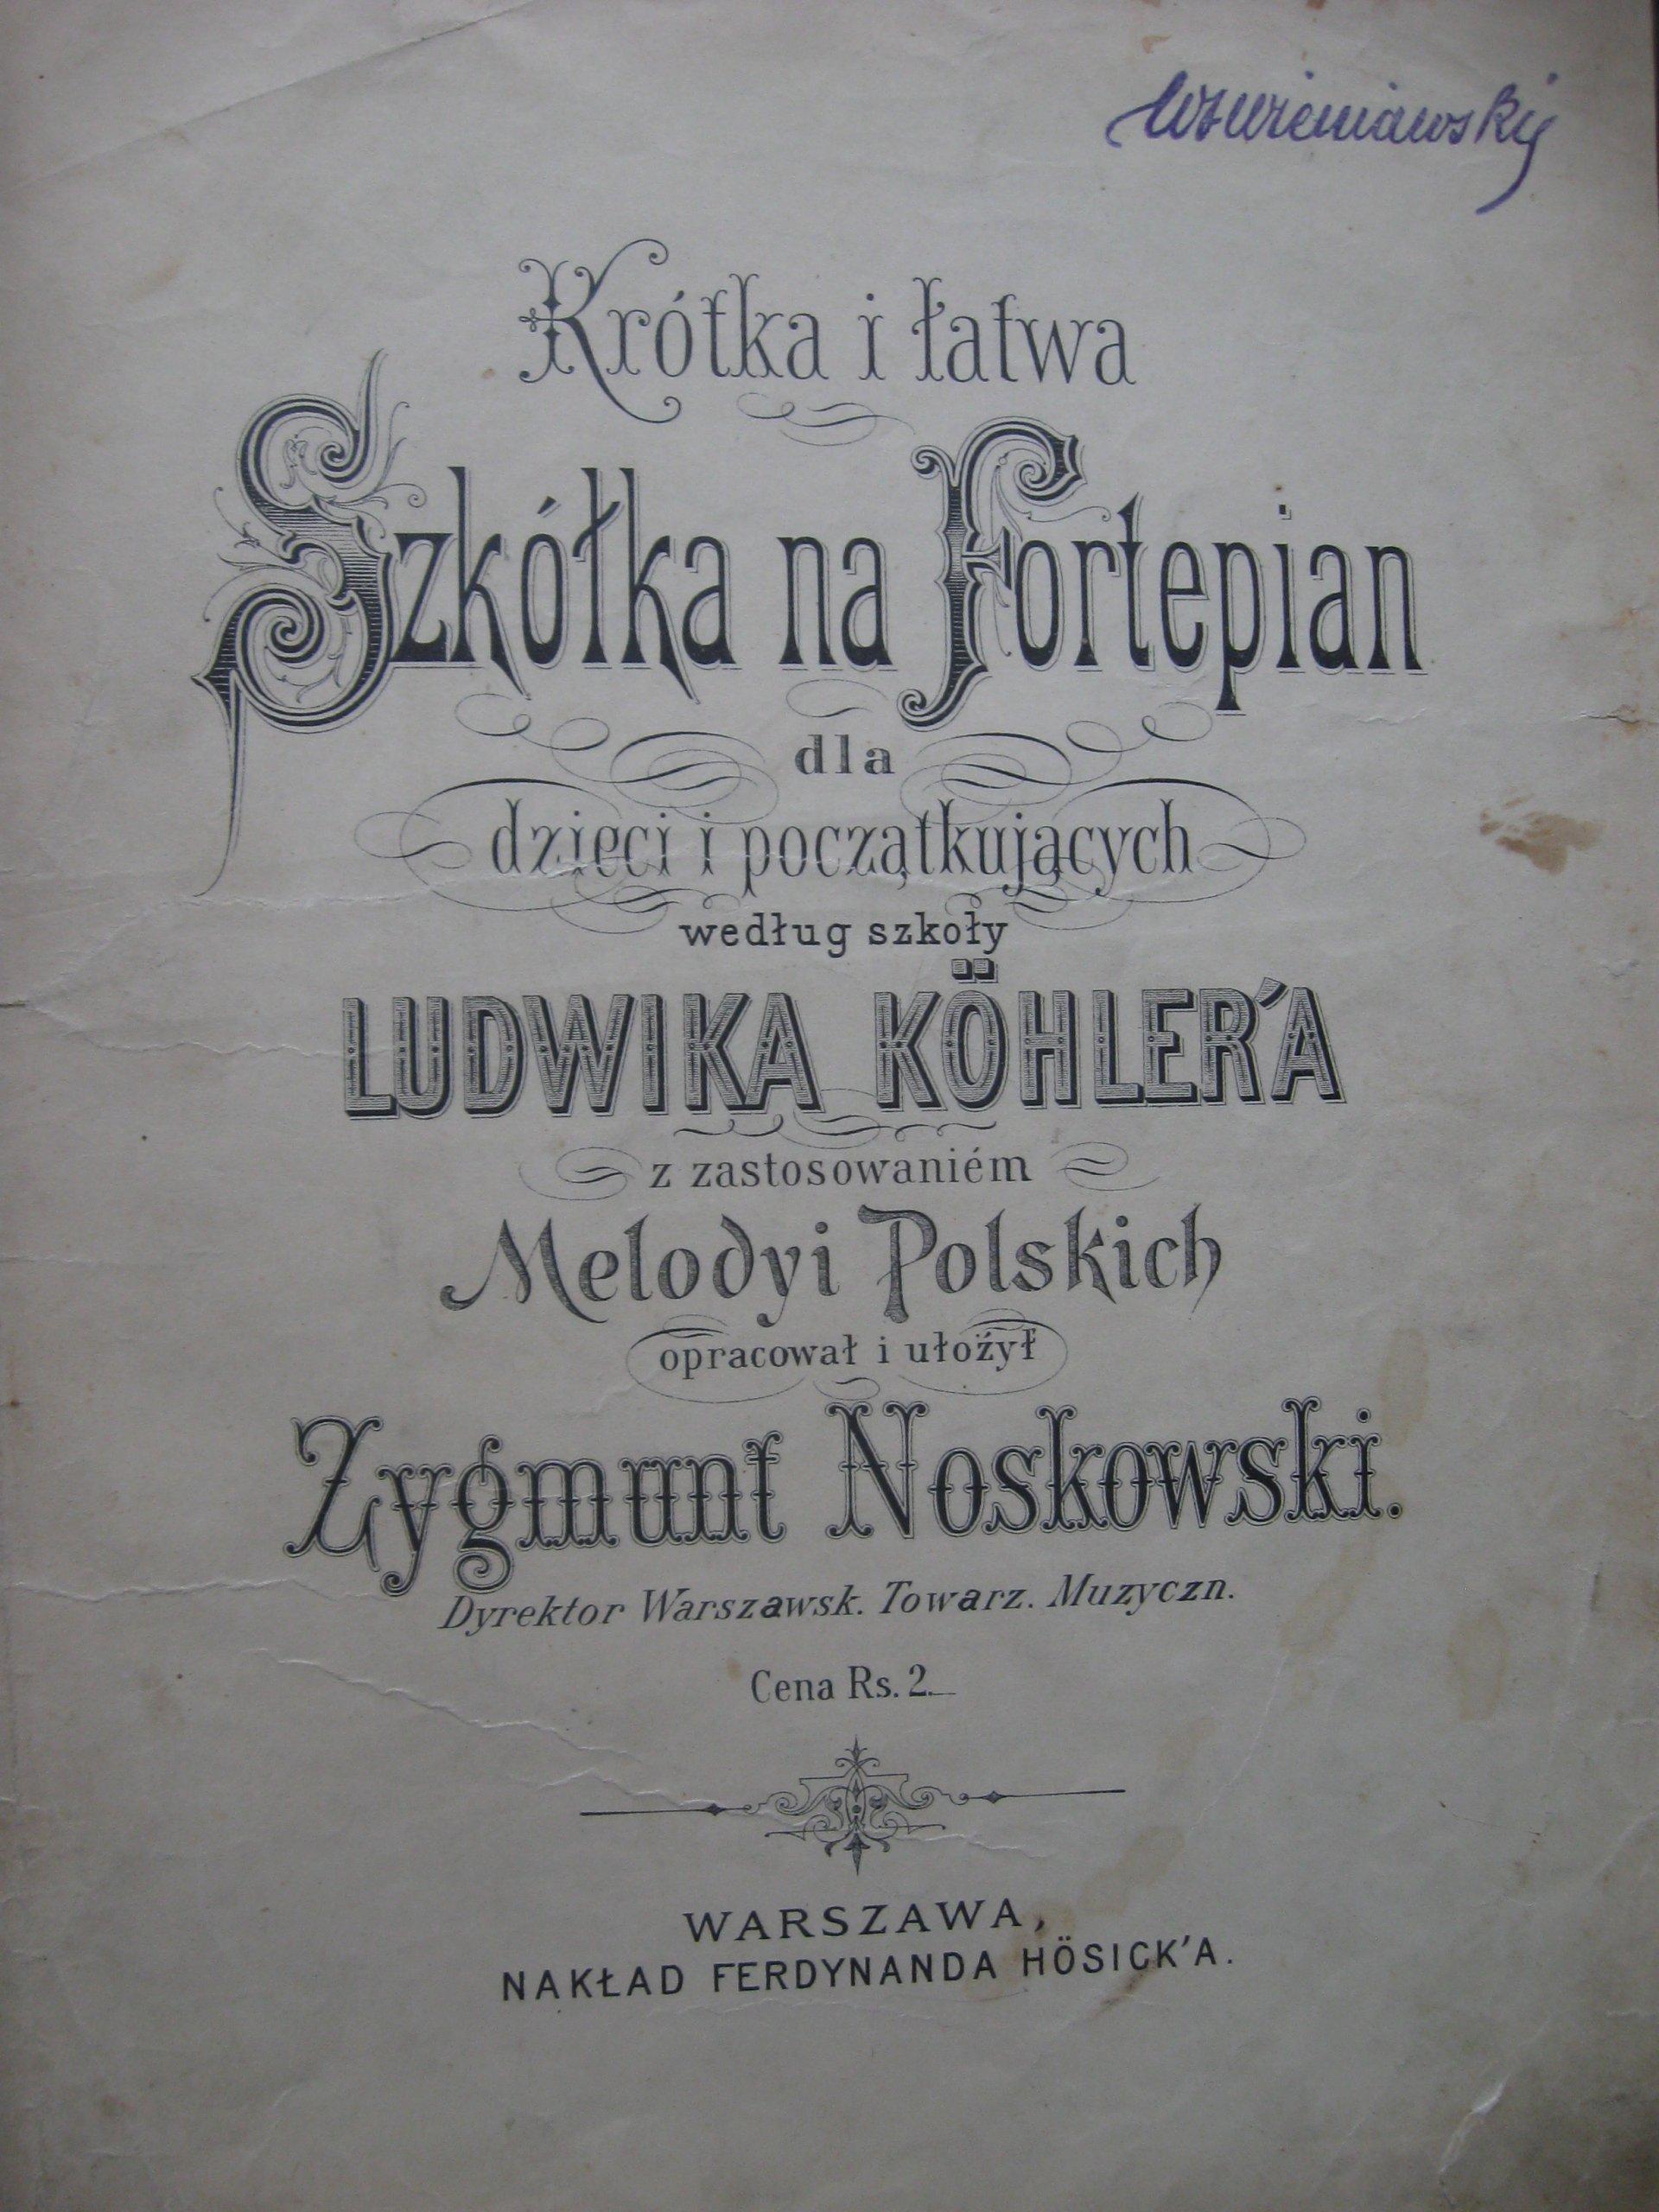 SZKÓŁKA na FORTEPIAN Melodyi polskich Koehler 1900